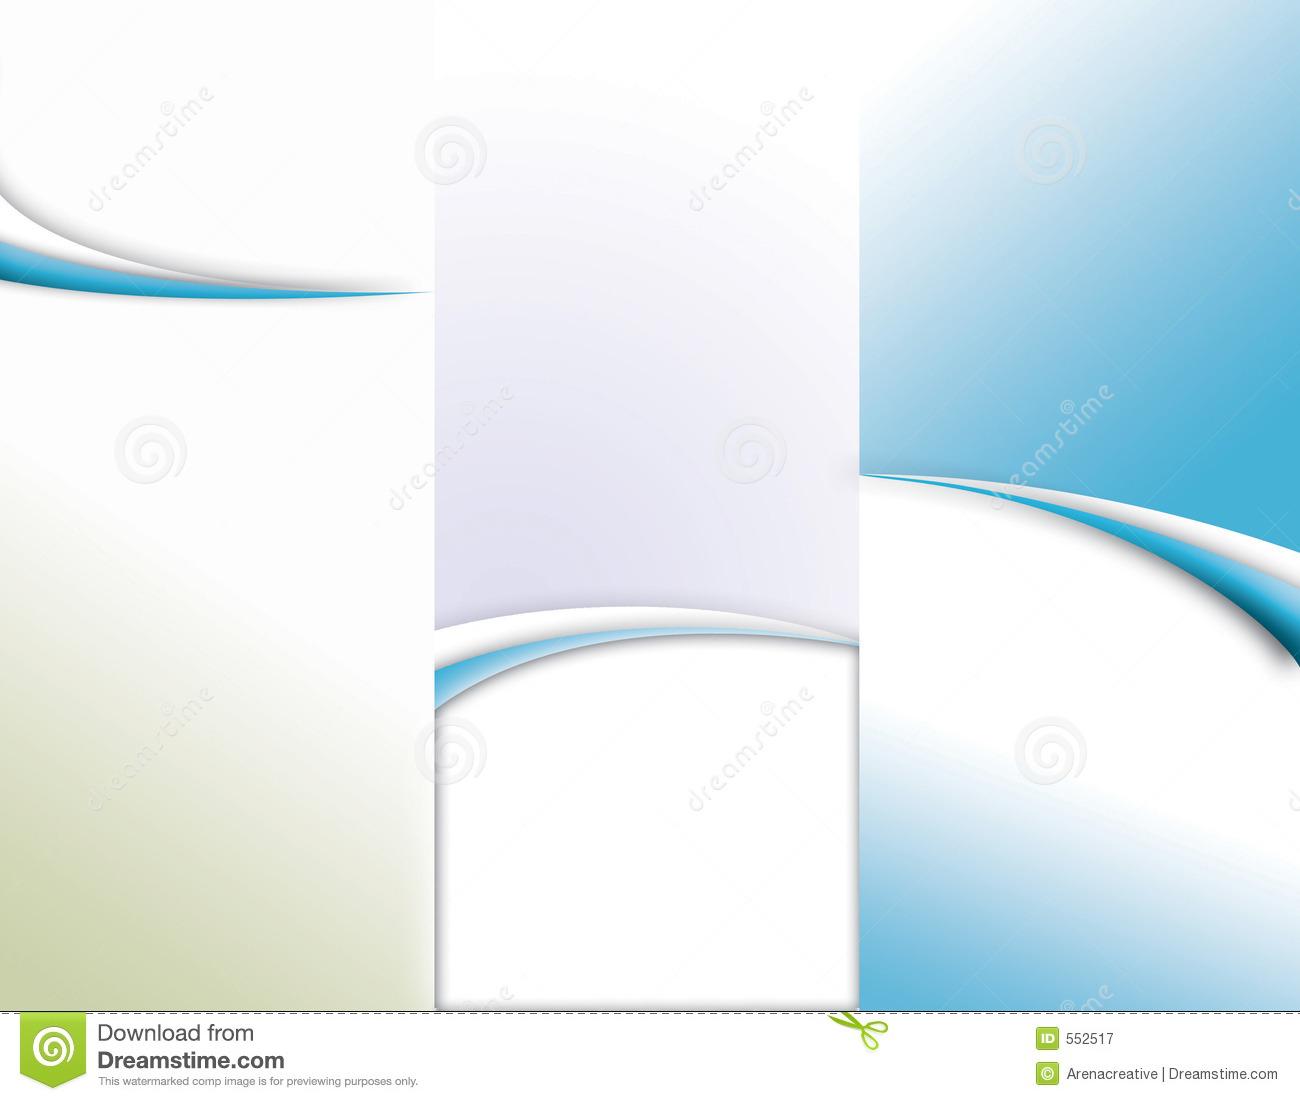 17 tri fold brochure design templates images tri fold brochure